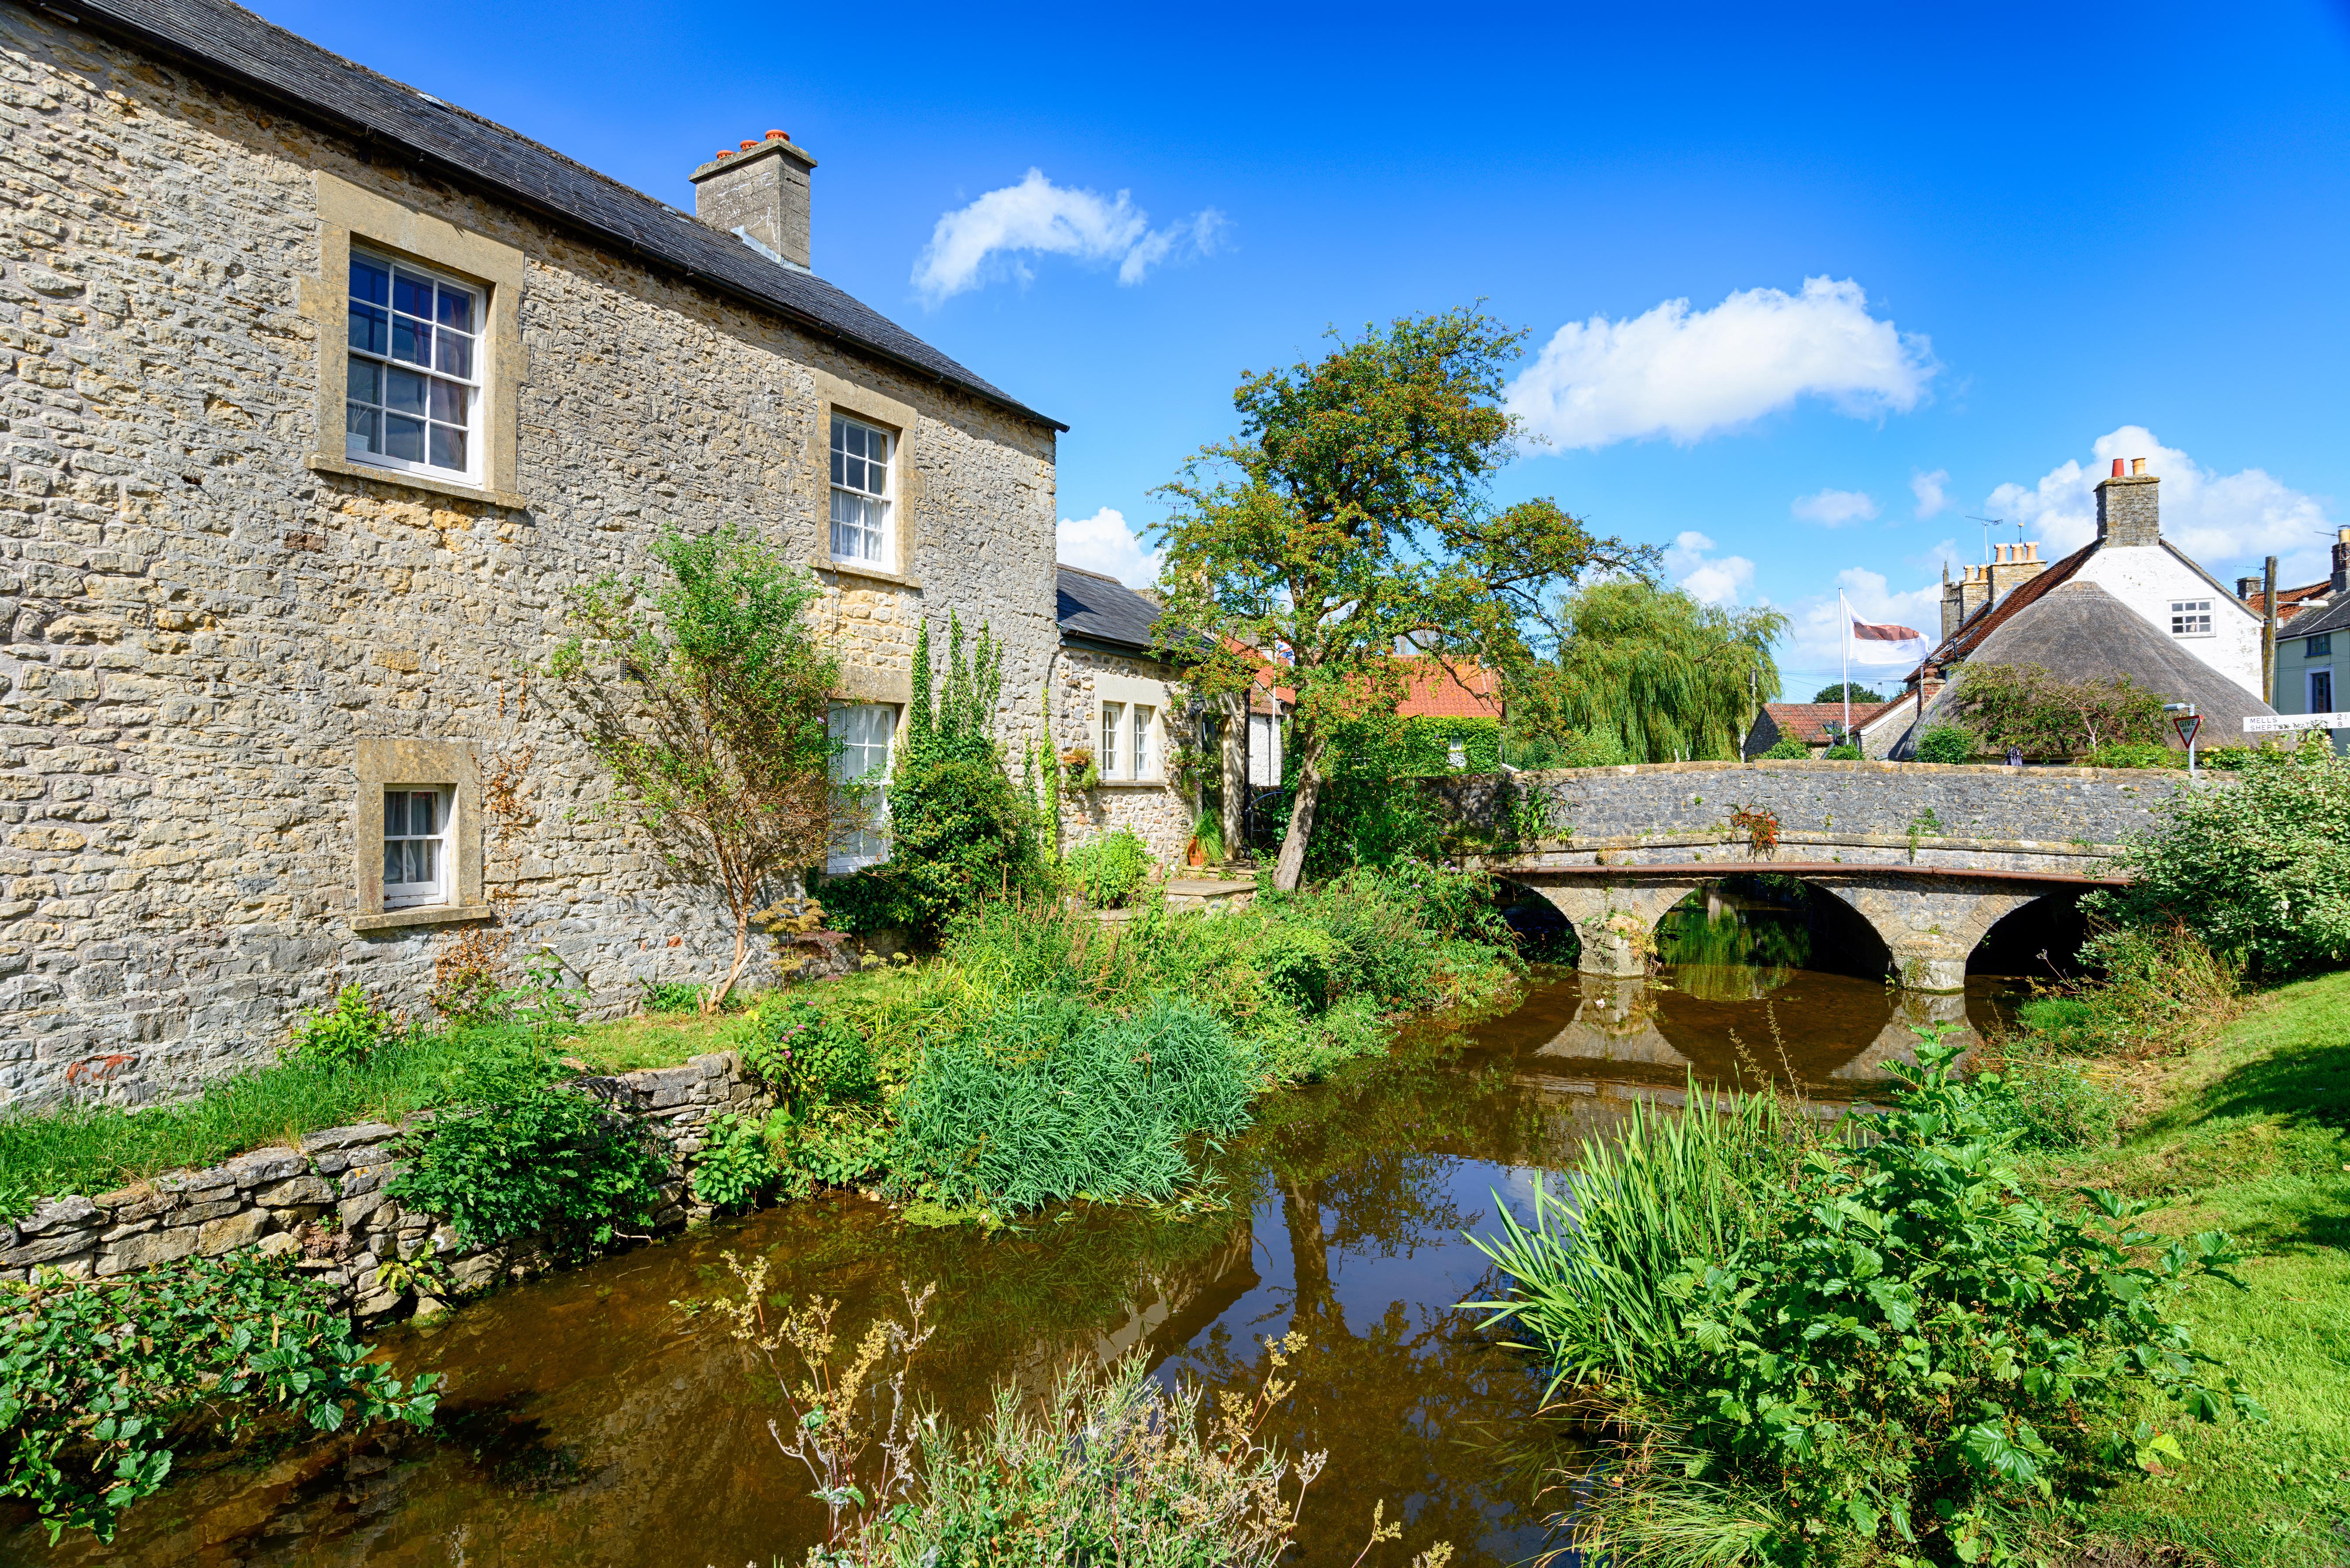 Nunney in Somerset